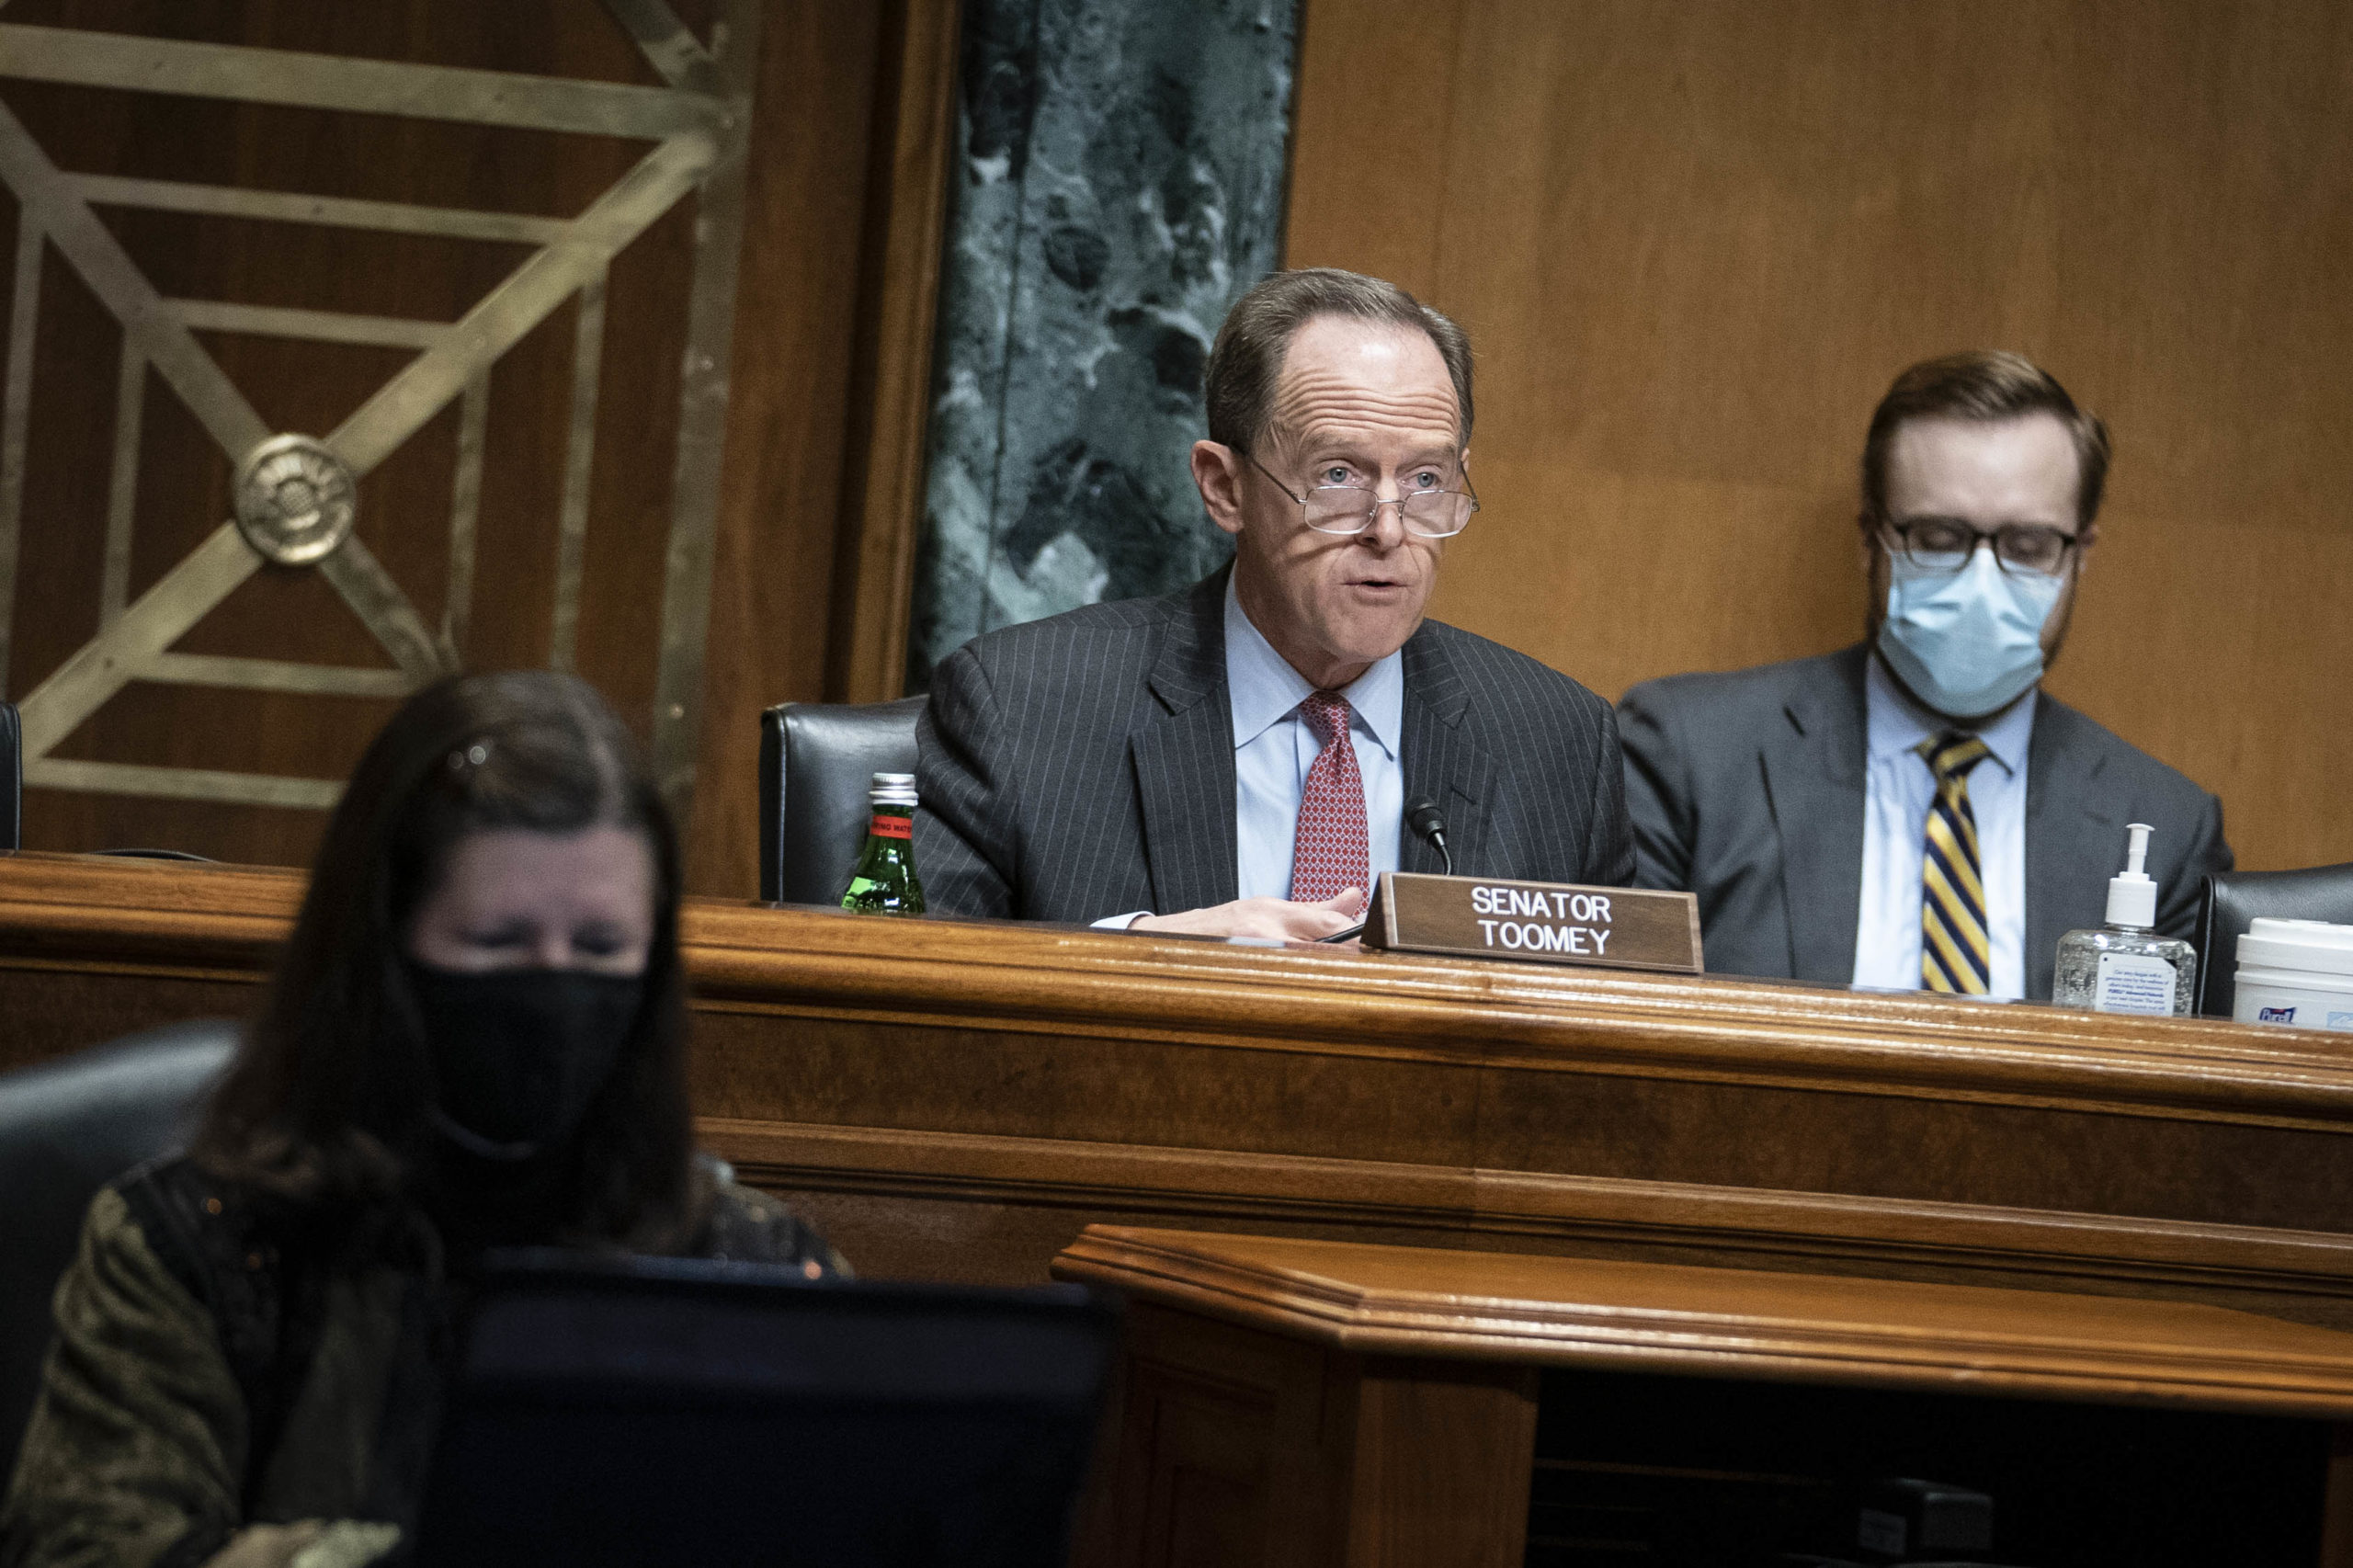 Sen. Pat Toomeyspeaks during a hearing on Dec. 10. (Sarah Silbiger/Pool/Getty Images)